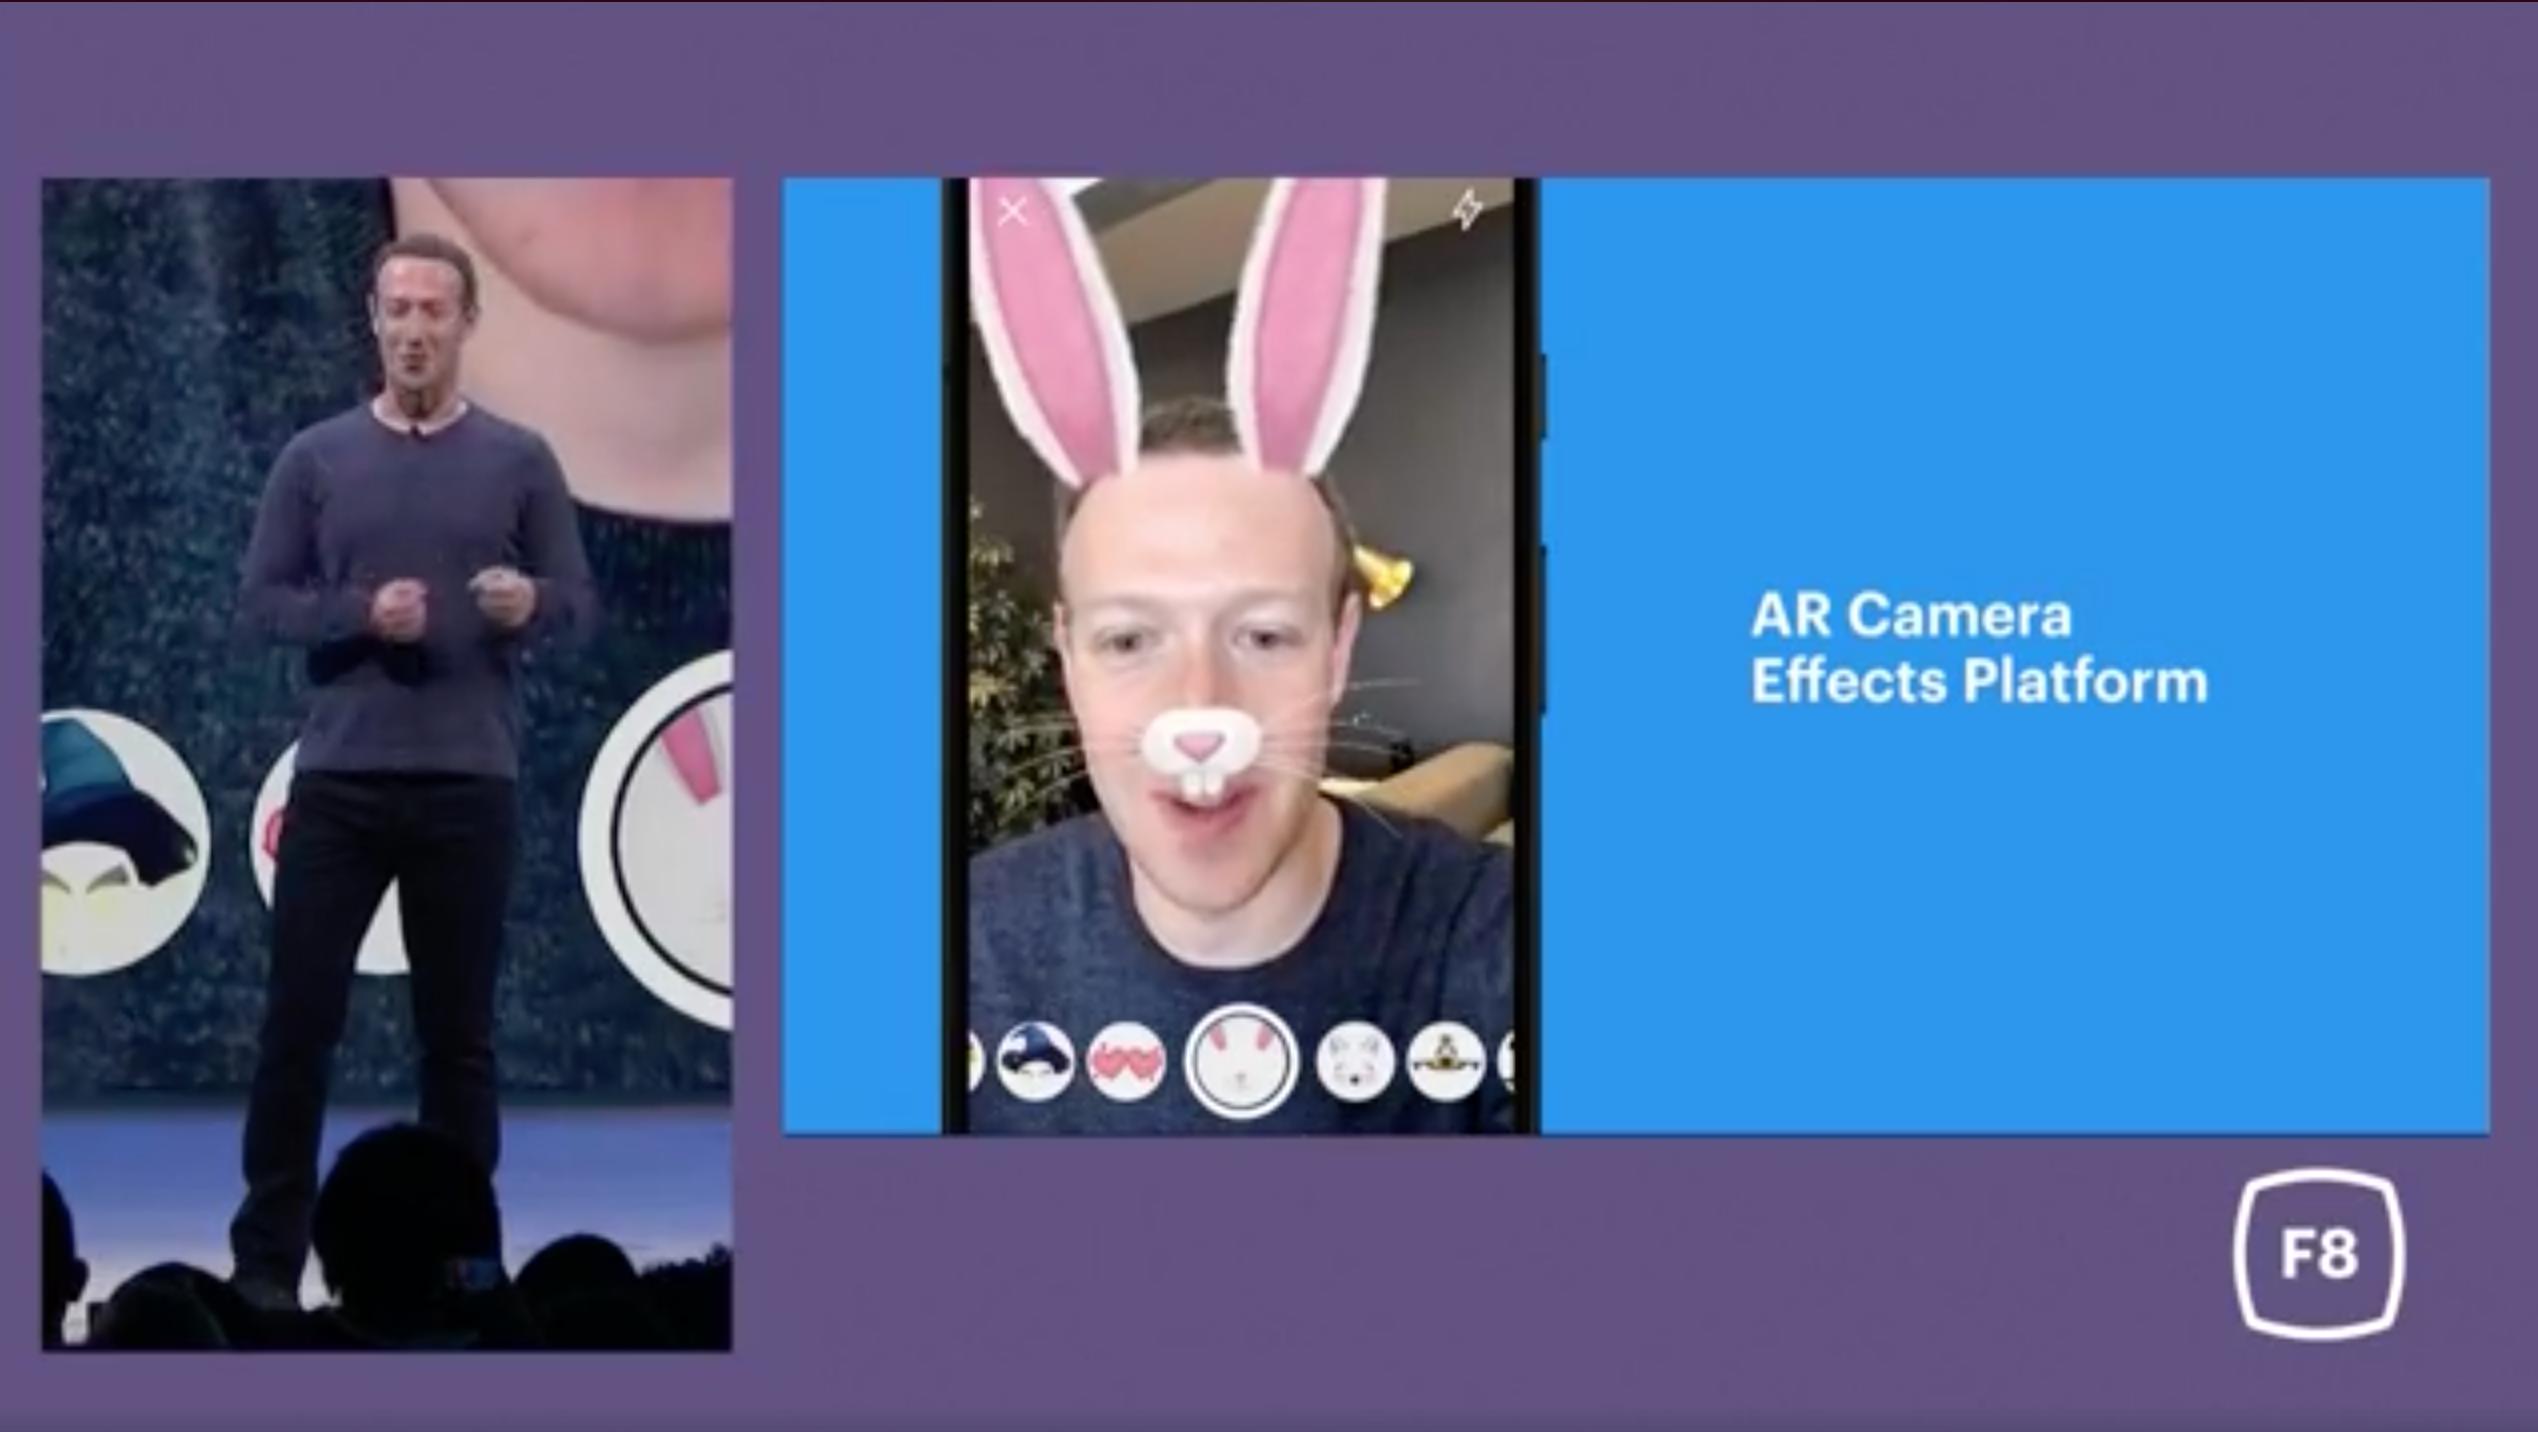 Facebook Messenger AR Camera Effects Platform